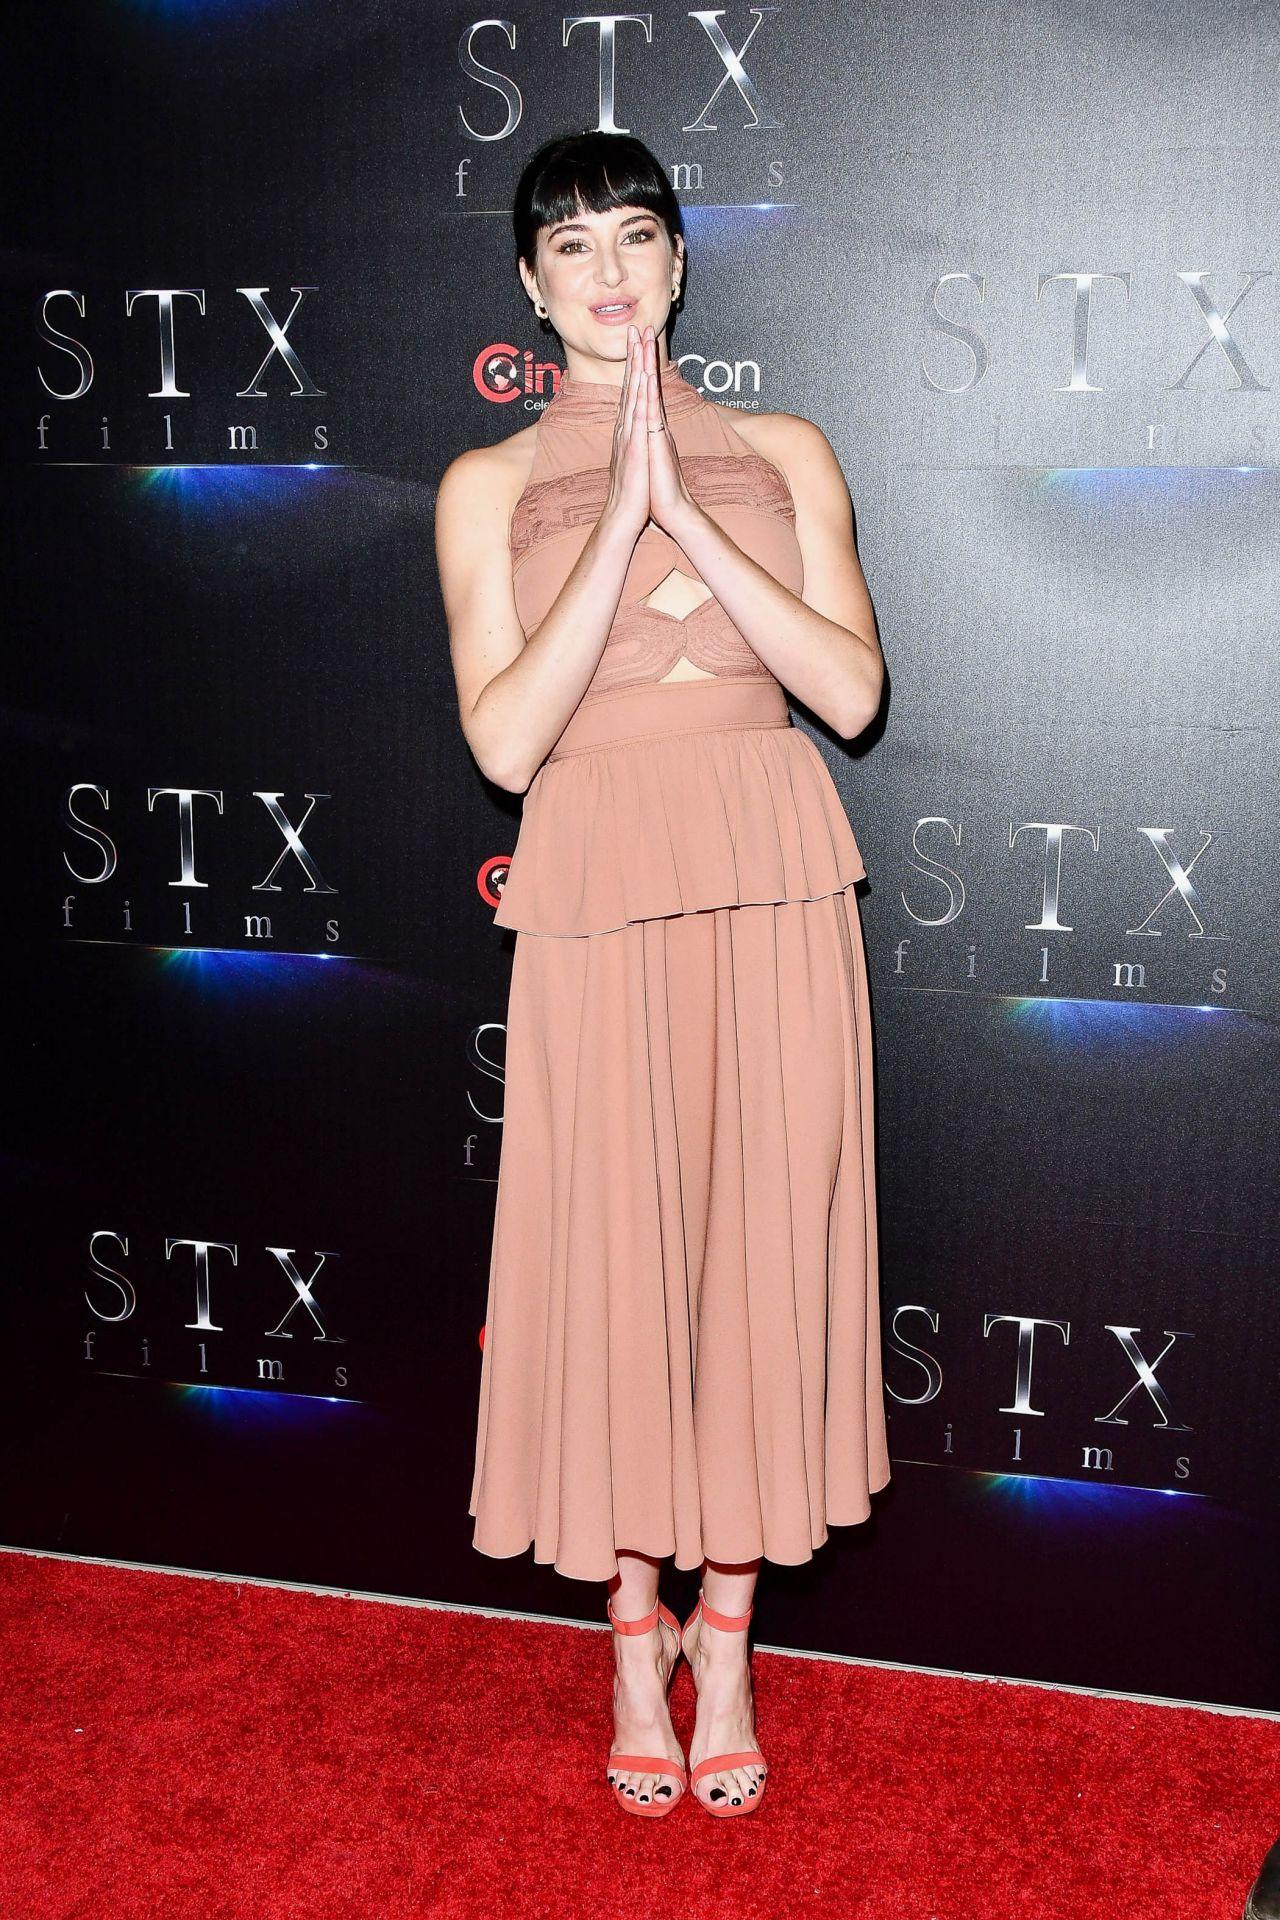 Shailene Woodley  STXfilms Presentation at CinemaCon 2018